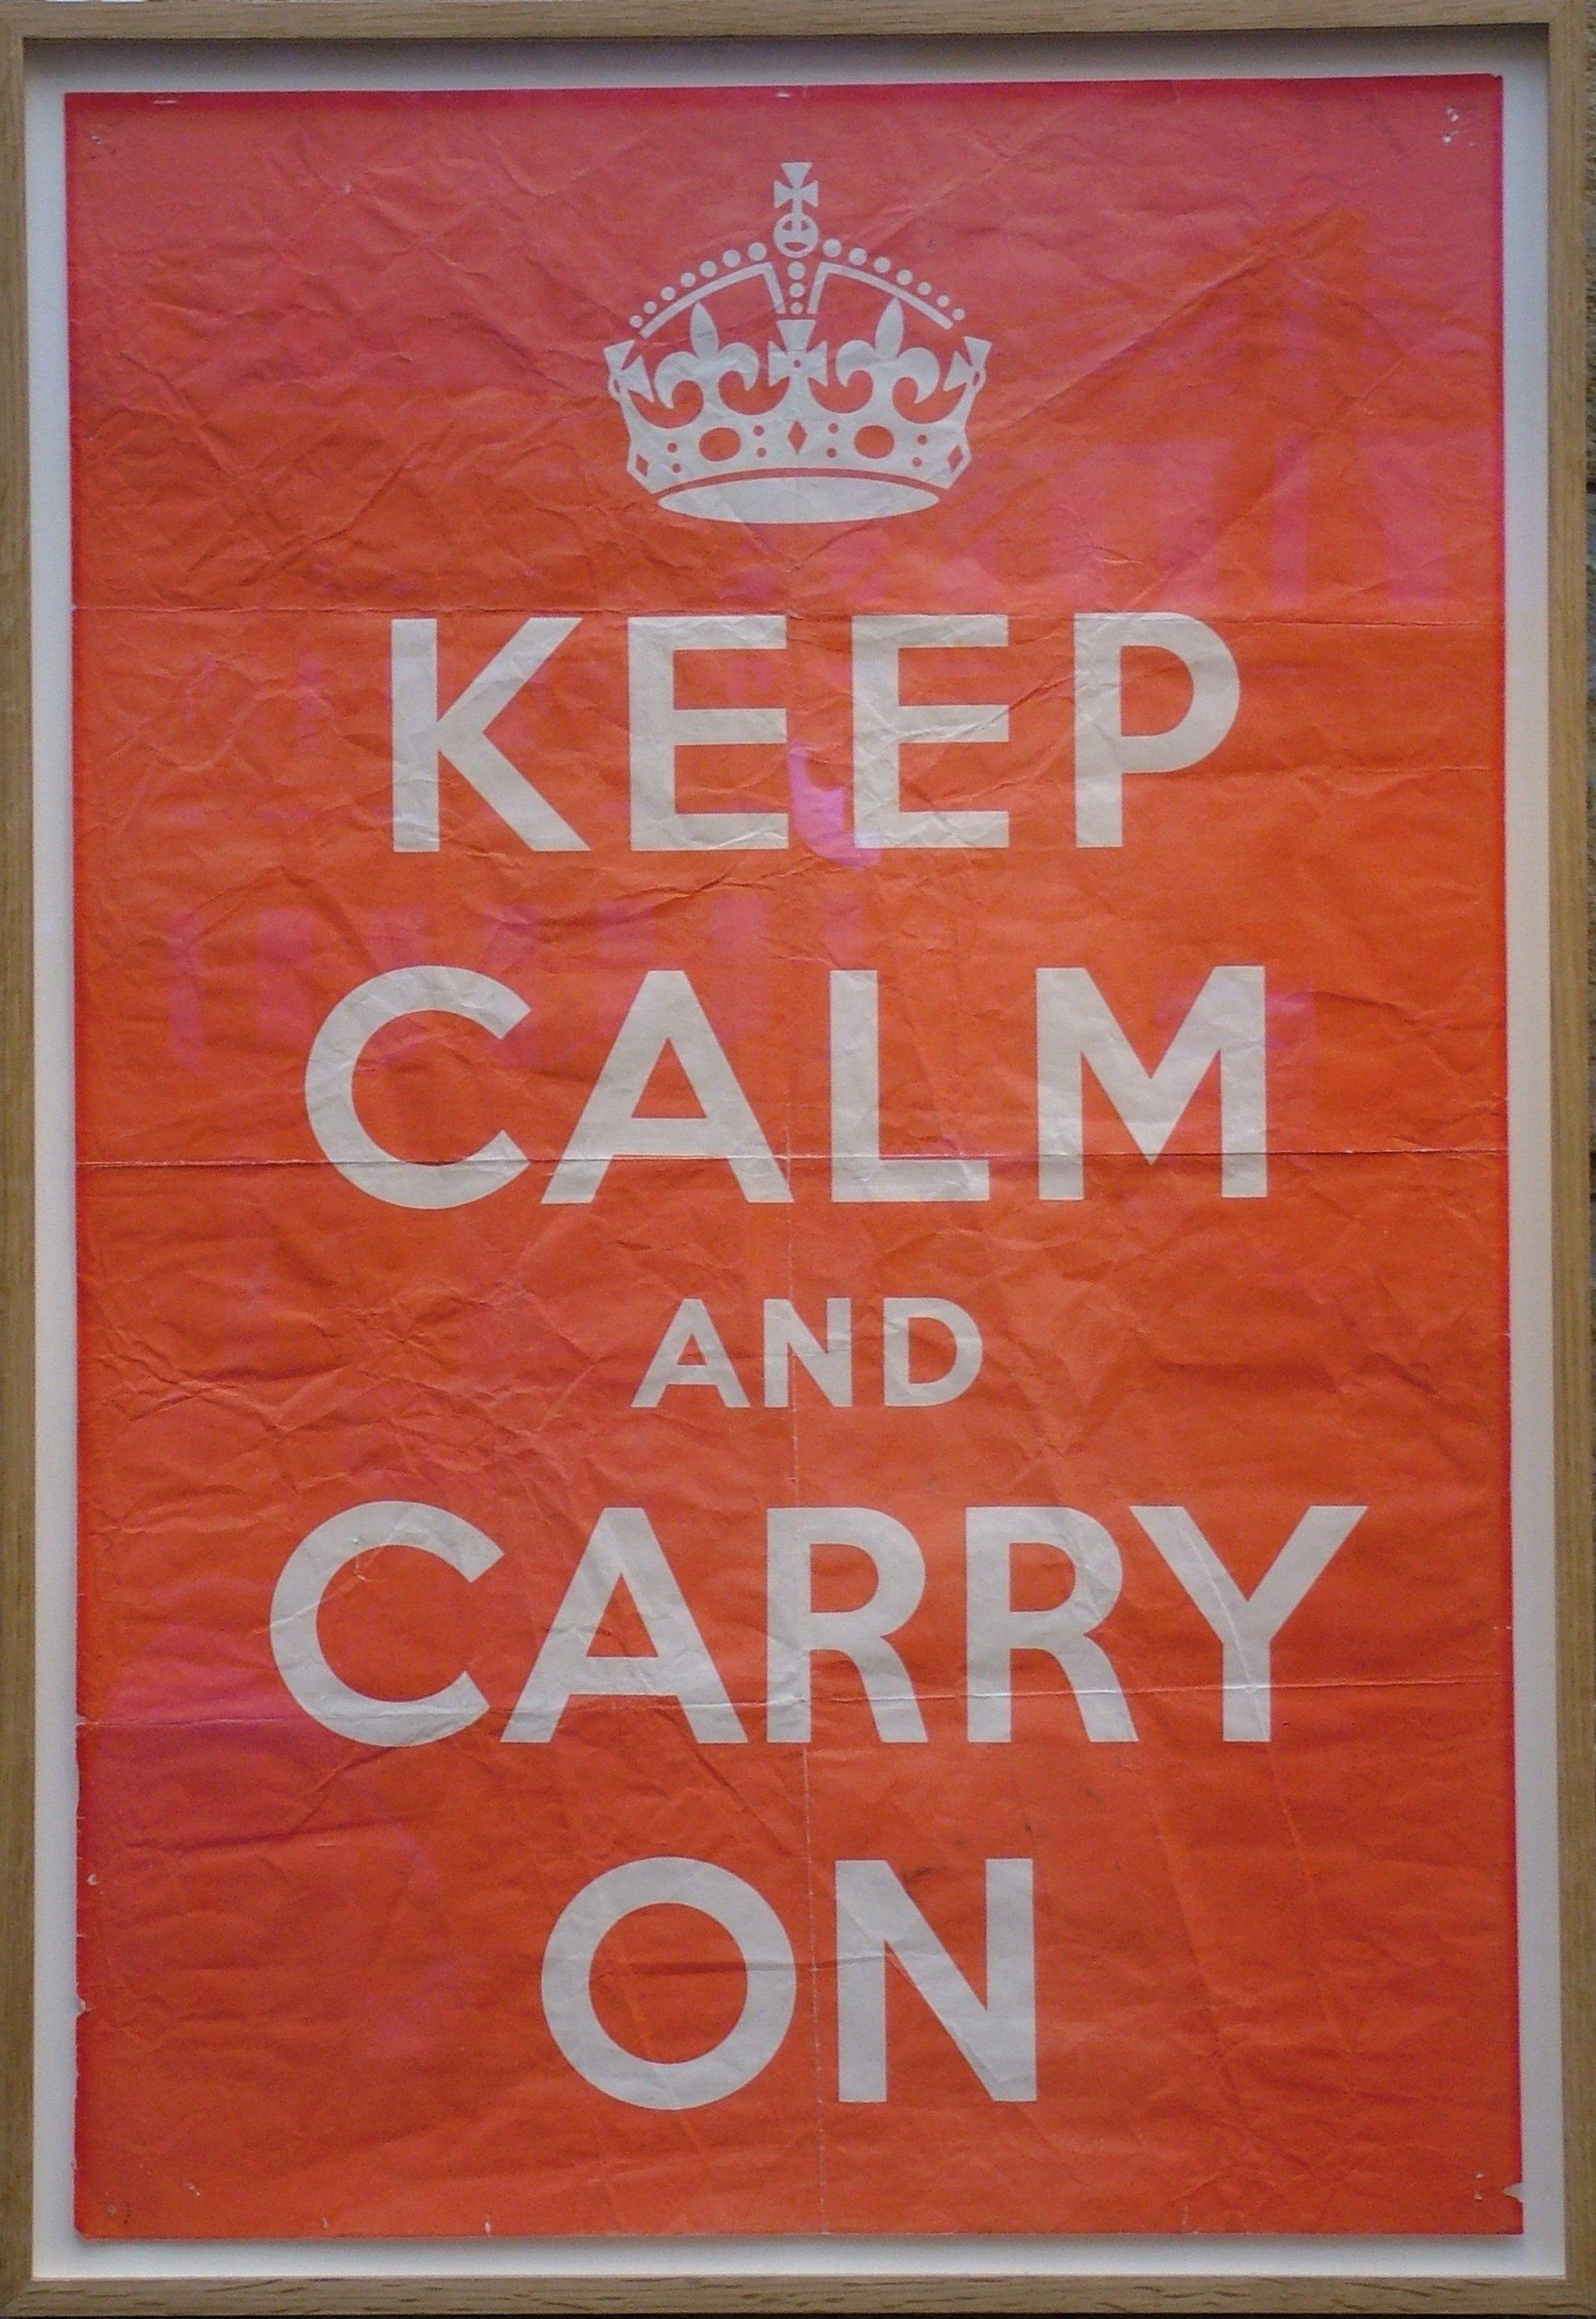 keep calm and carry onのパロディが面白い 目を背けた先